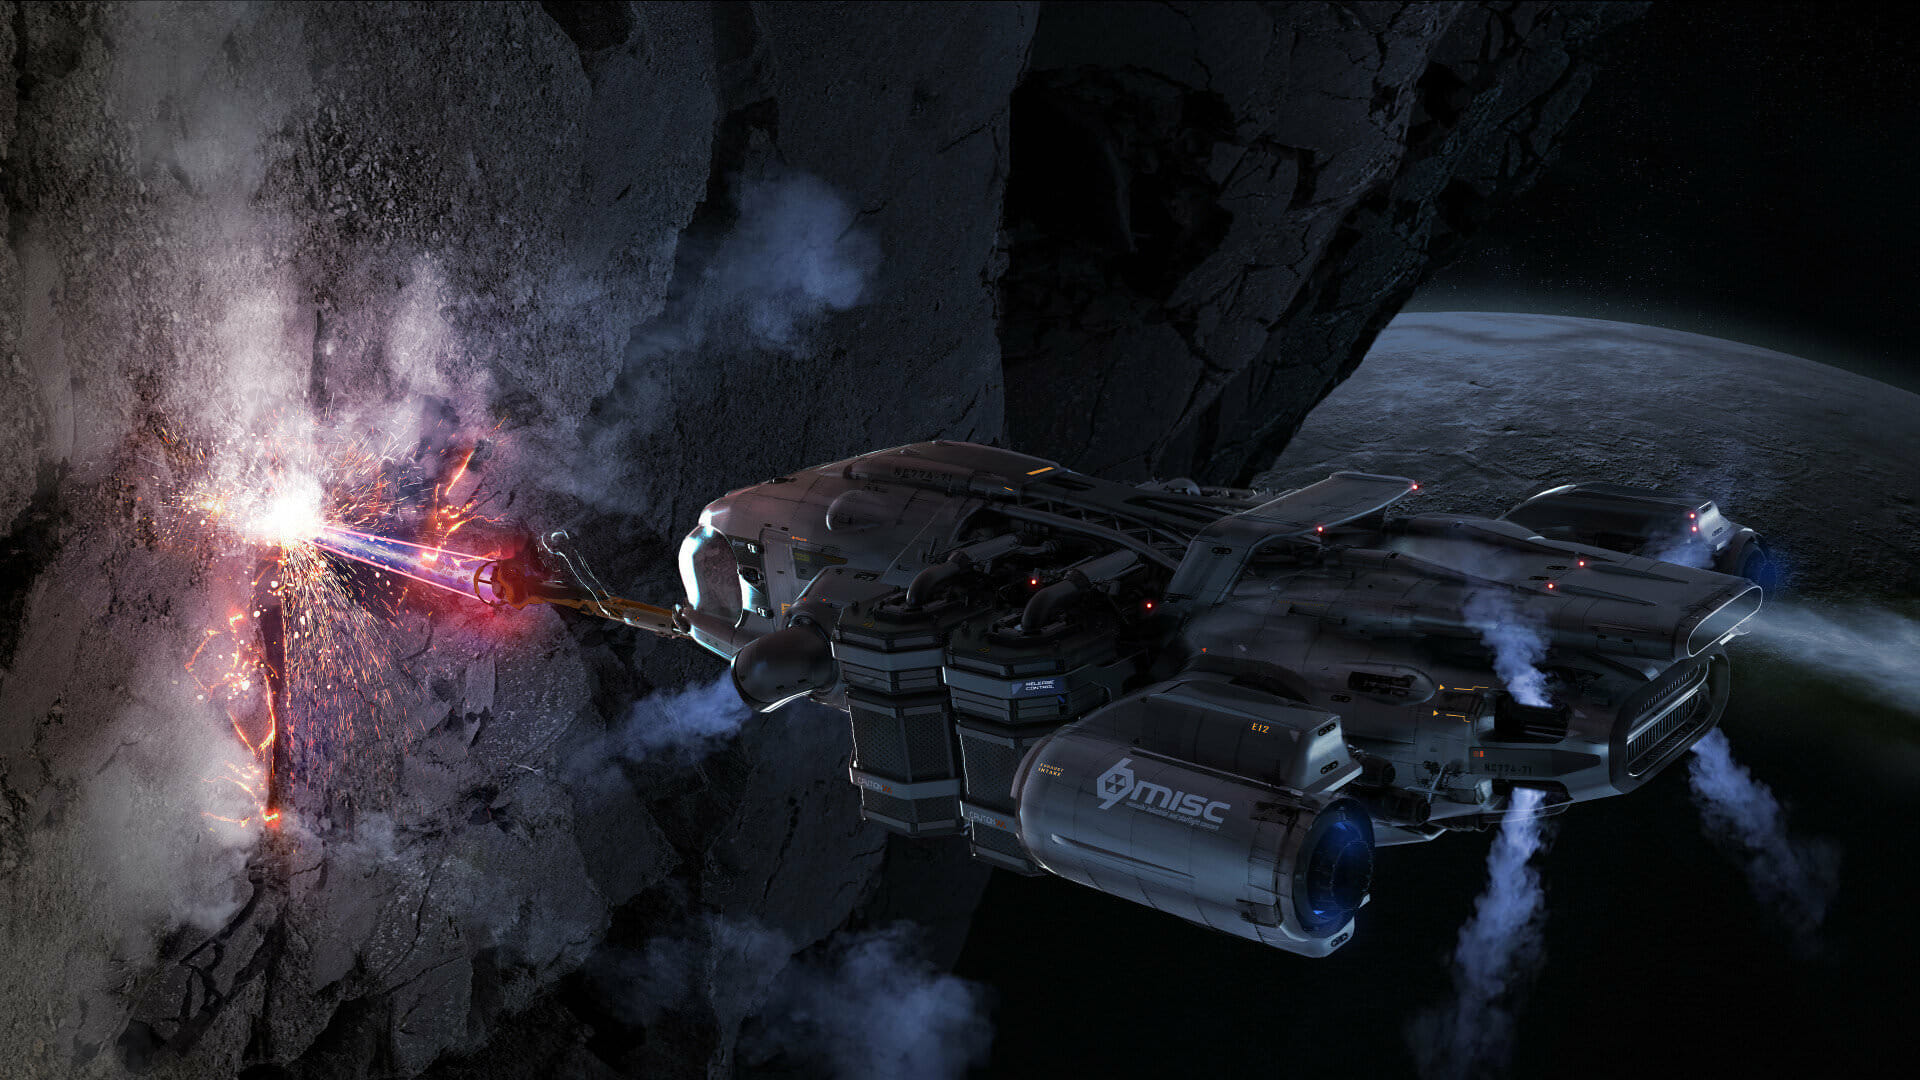 Alla_Scoperta_MISC_Prospector - MISC-Mining-Vehicle-PIECE-4-V21.jpg